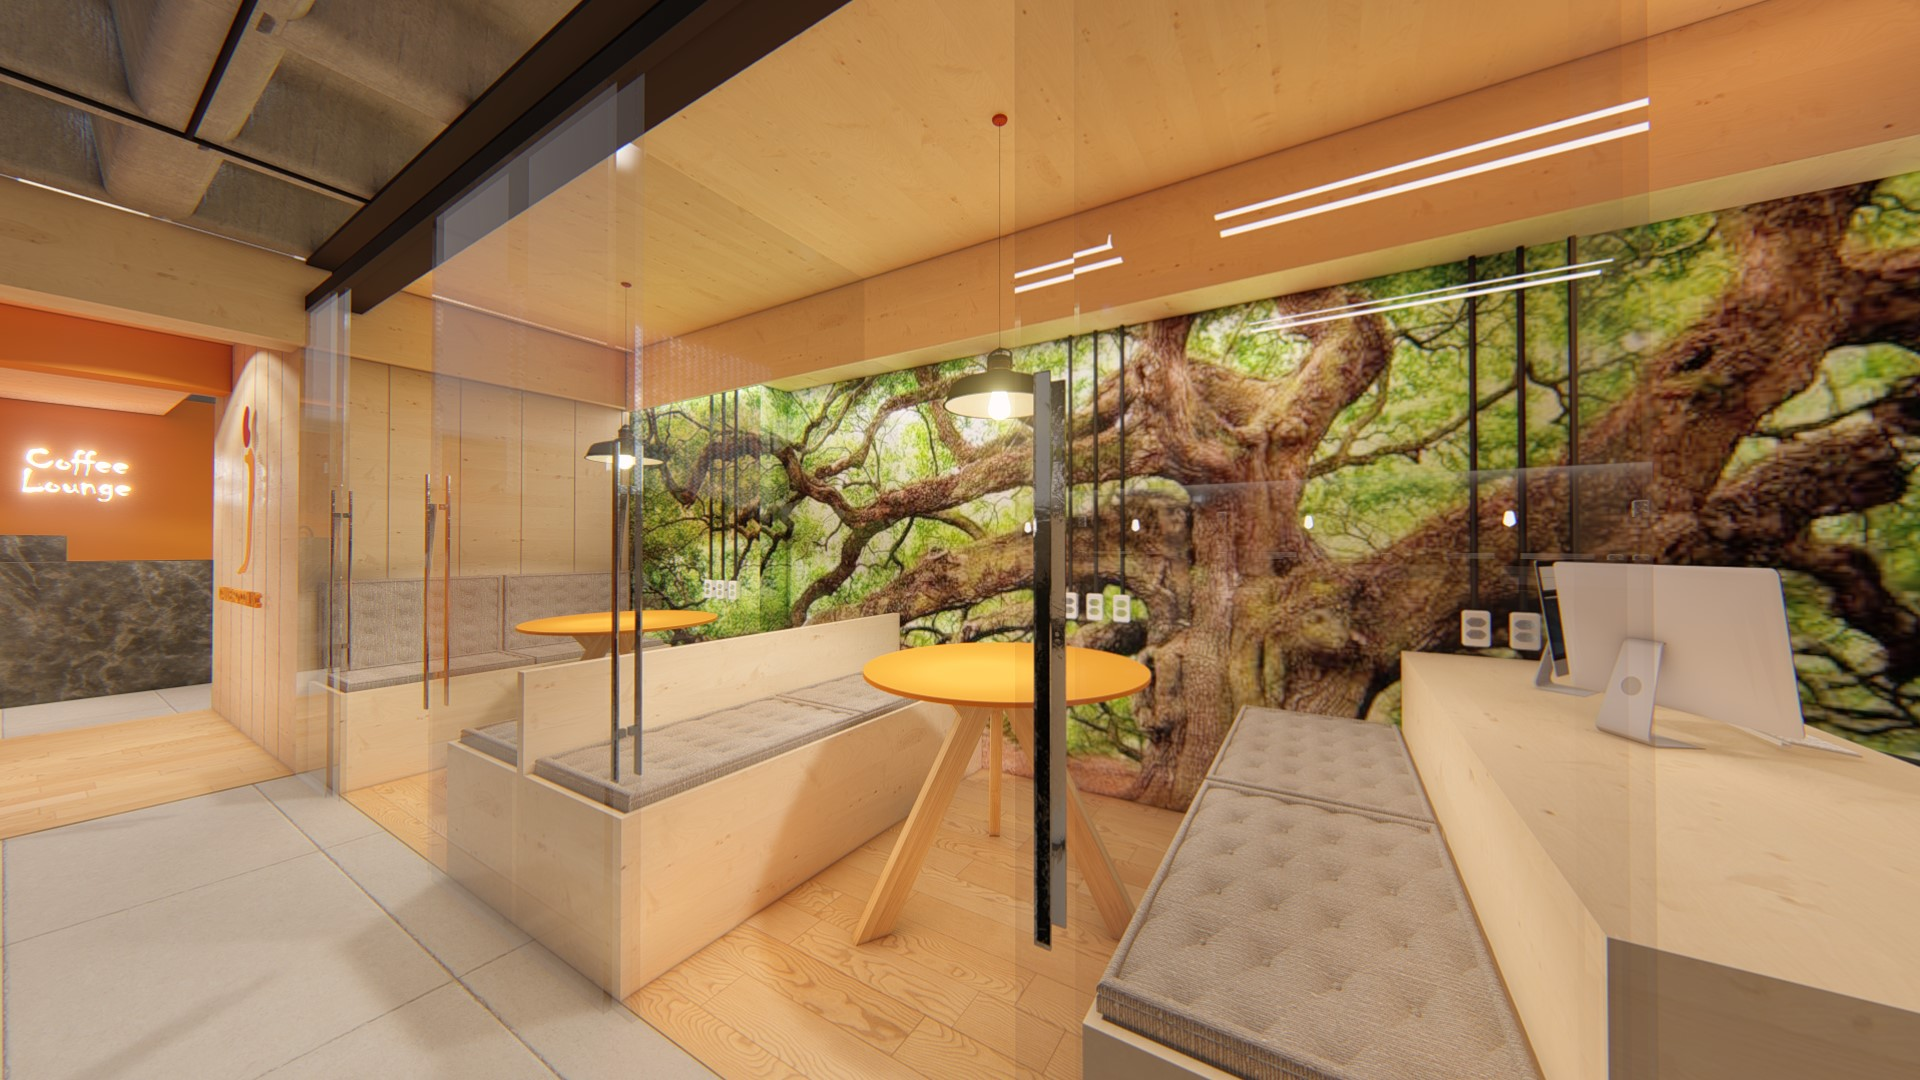 projeto-arquitetonico-cajueiro-duo-arquitetura-017.jpg